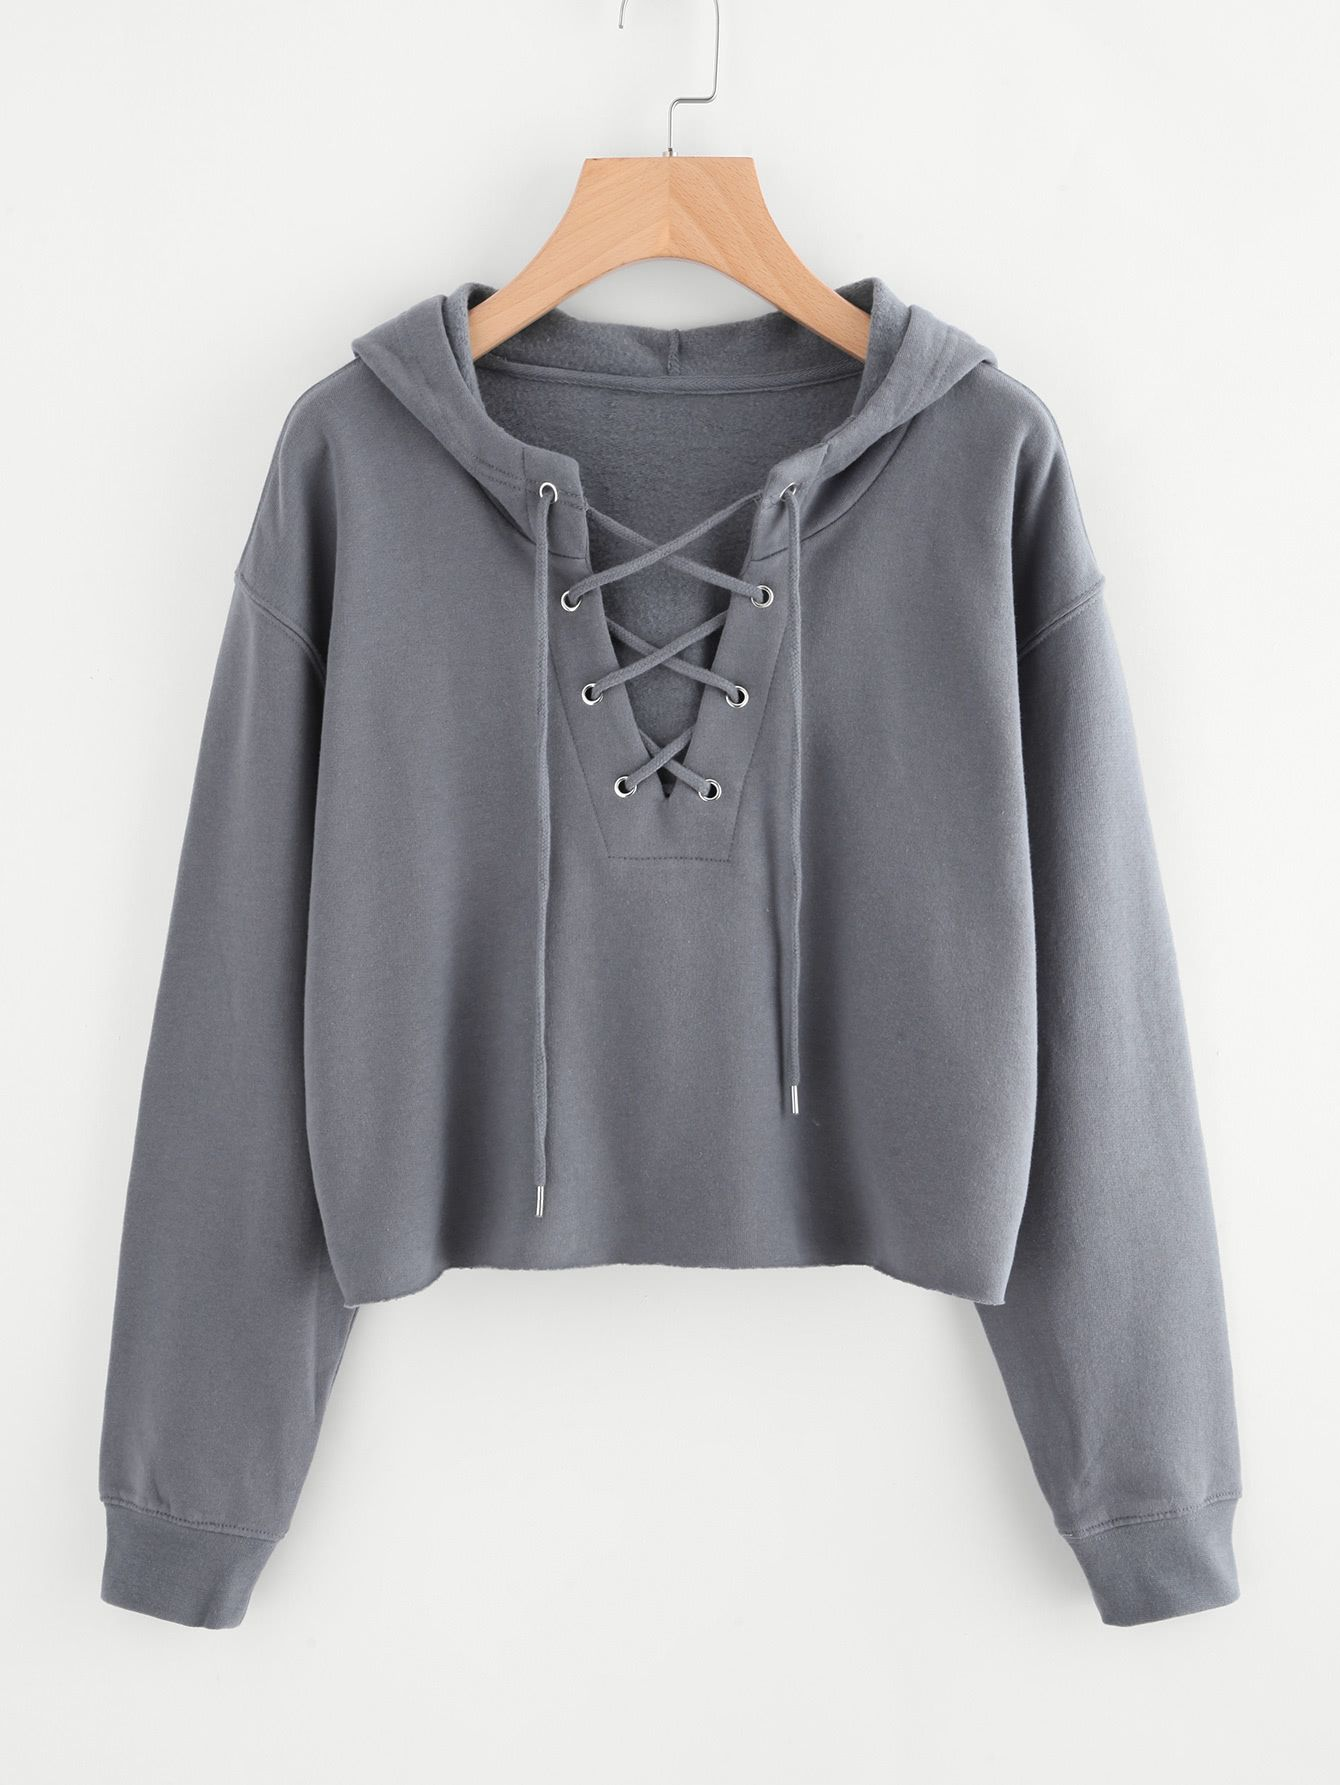 Drop Shoulder Eyelet Lace Up Sweatshirt